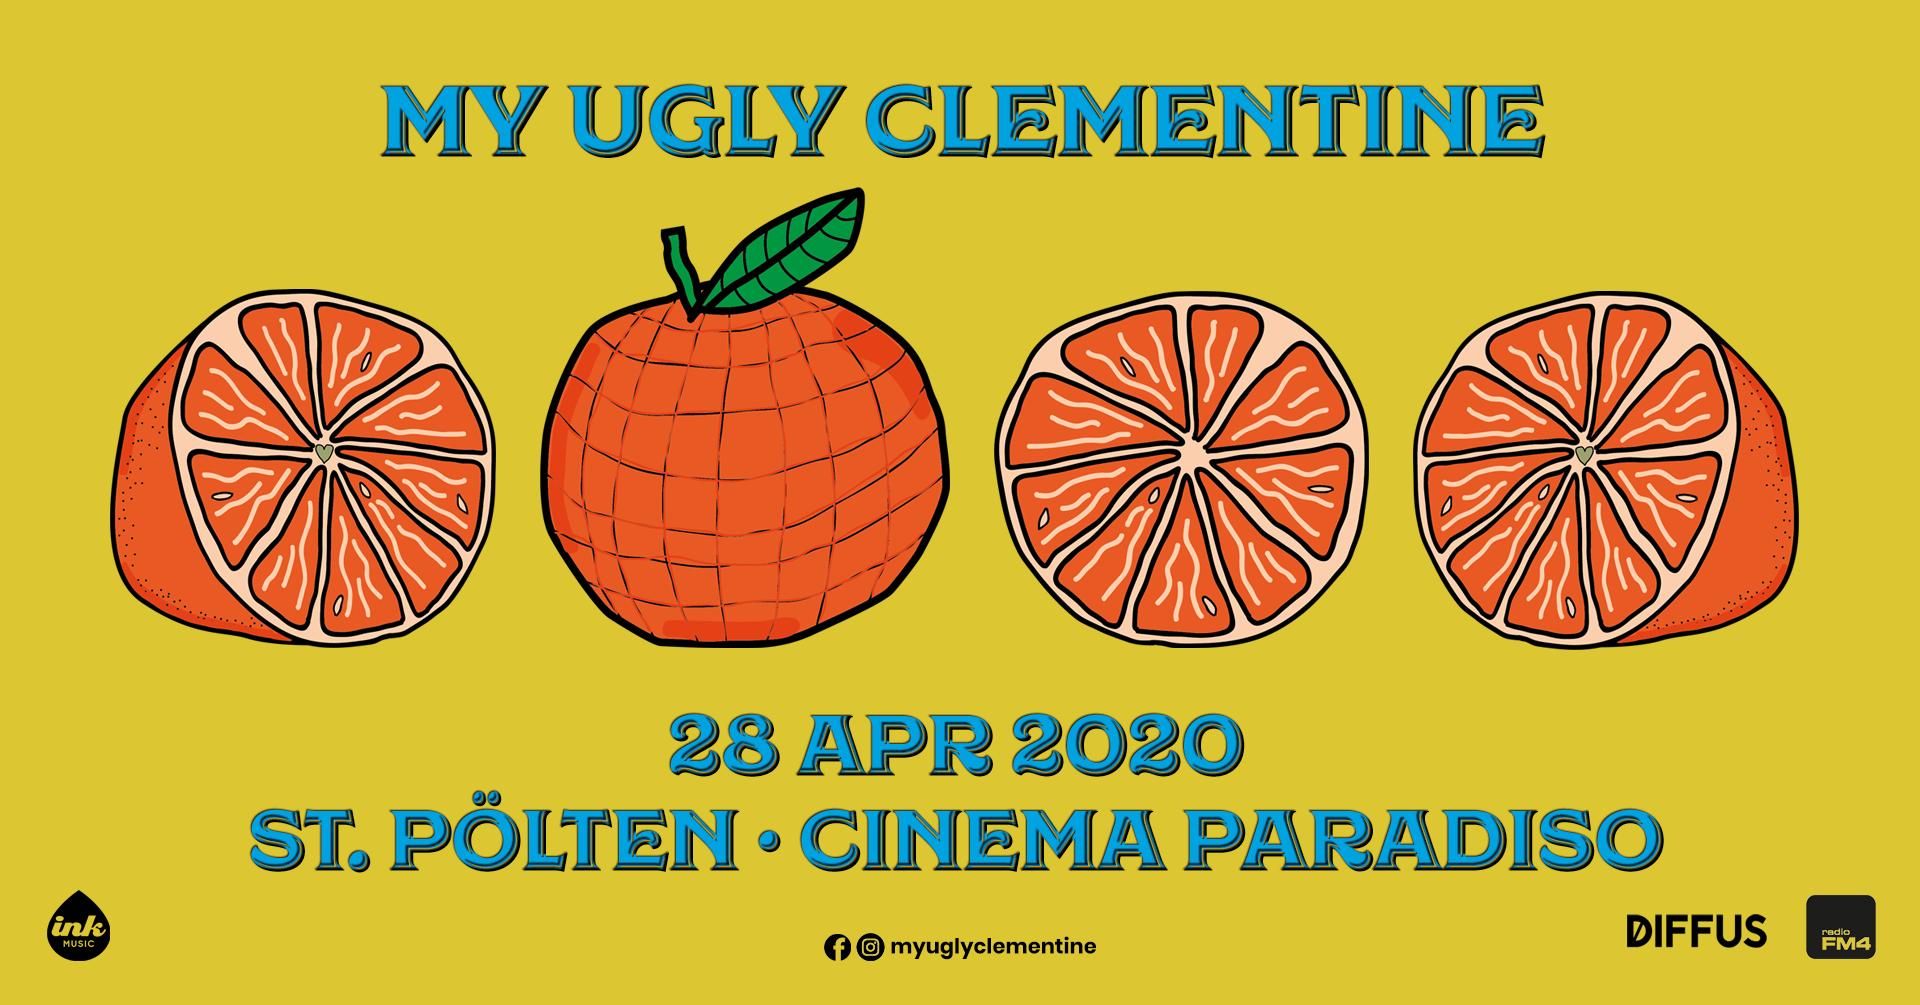 My Ugly Clementine im Club 3 // Cinema Paradiso am 28. April 2020 @ Cinema Paradiso.